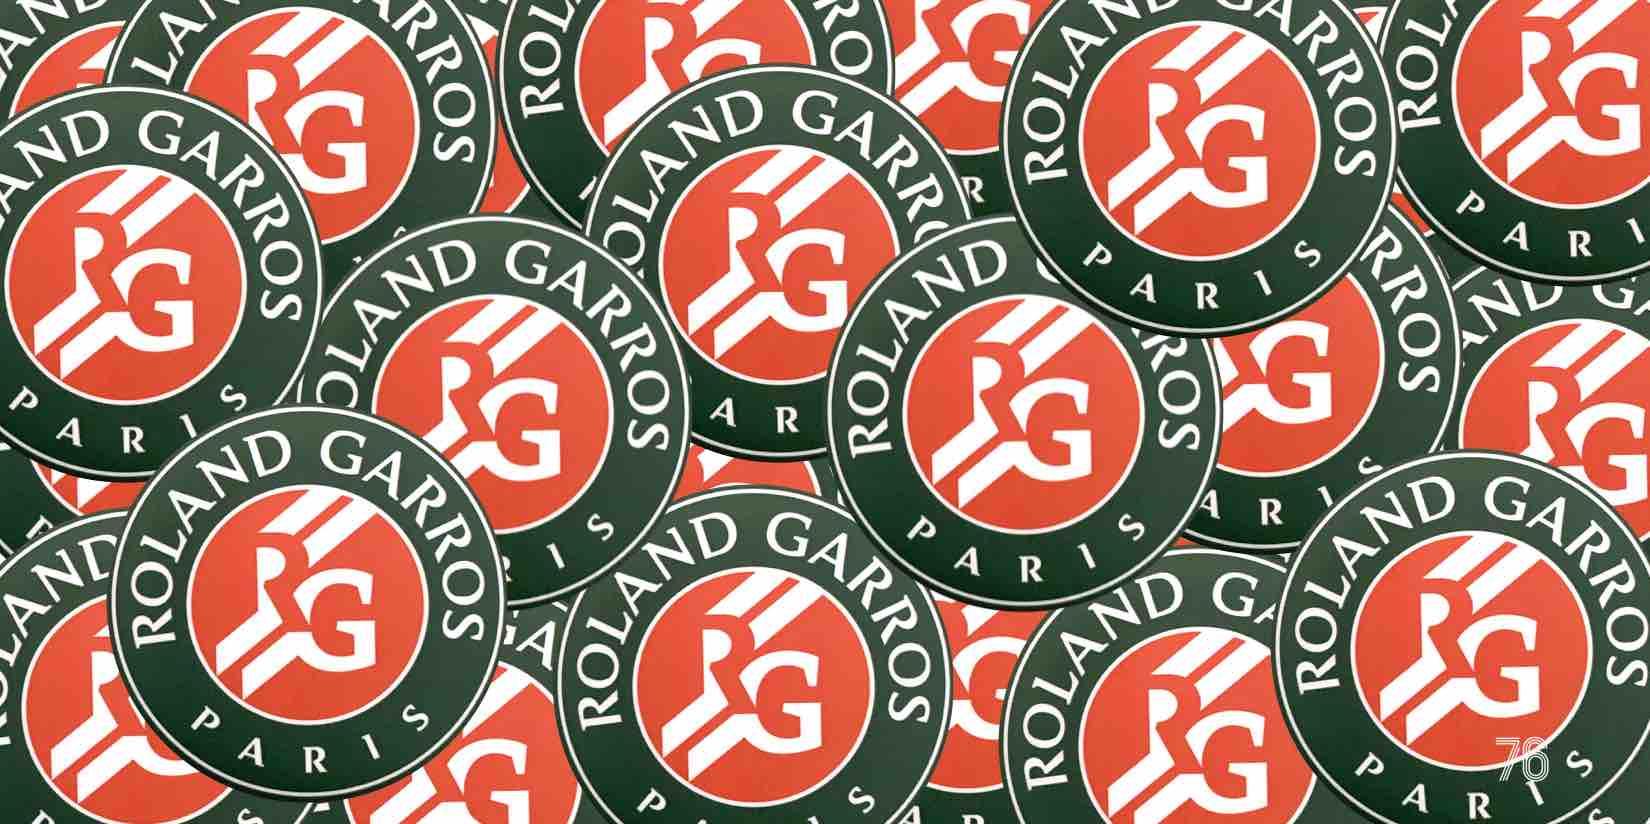 Sorteggio Roland Garros 2021 - settesei.it